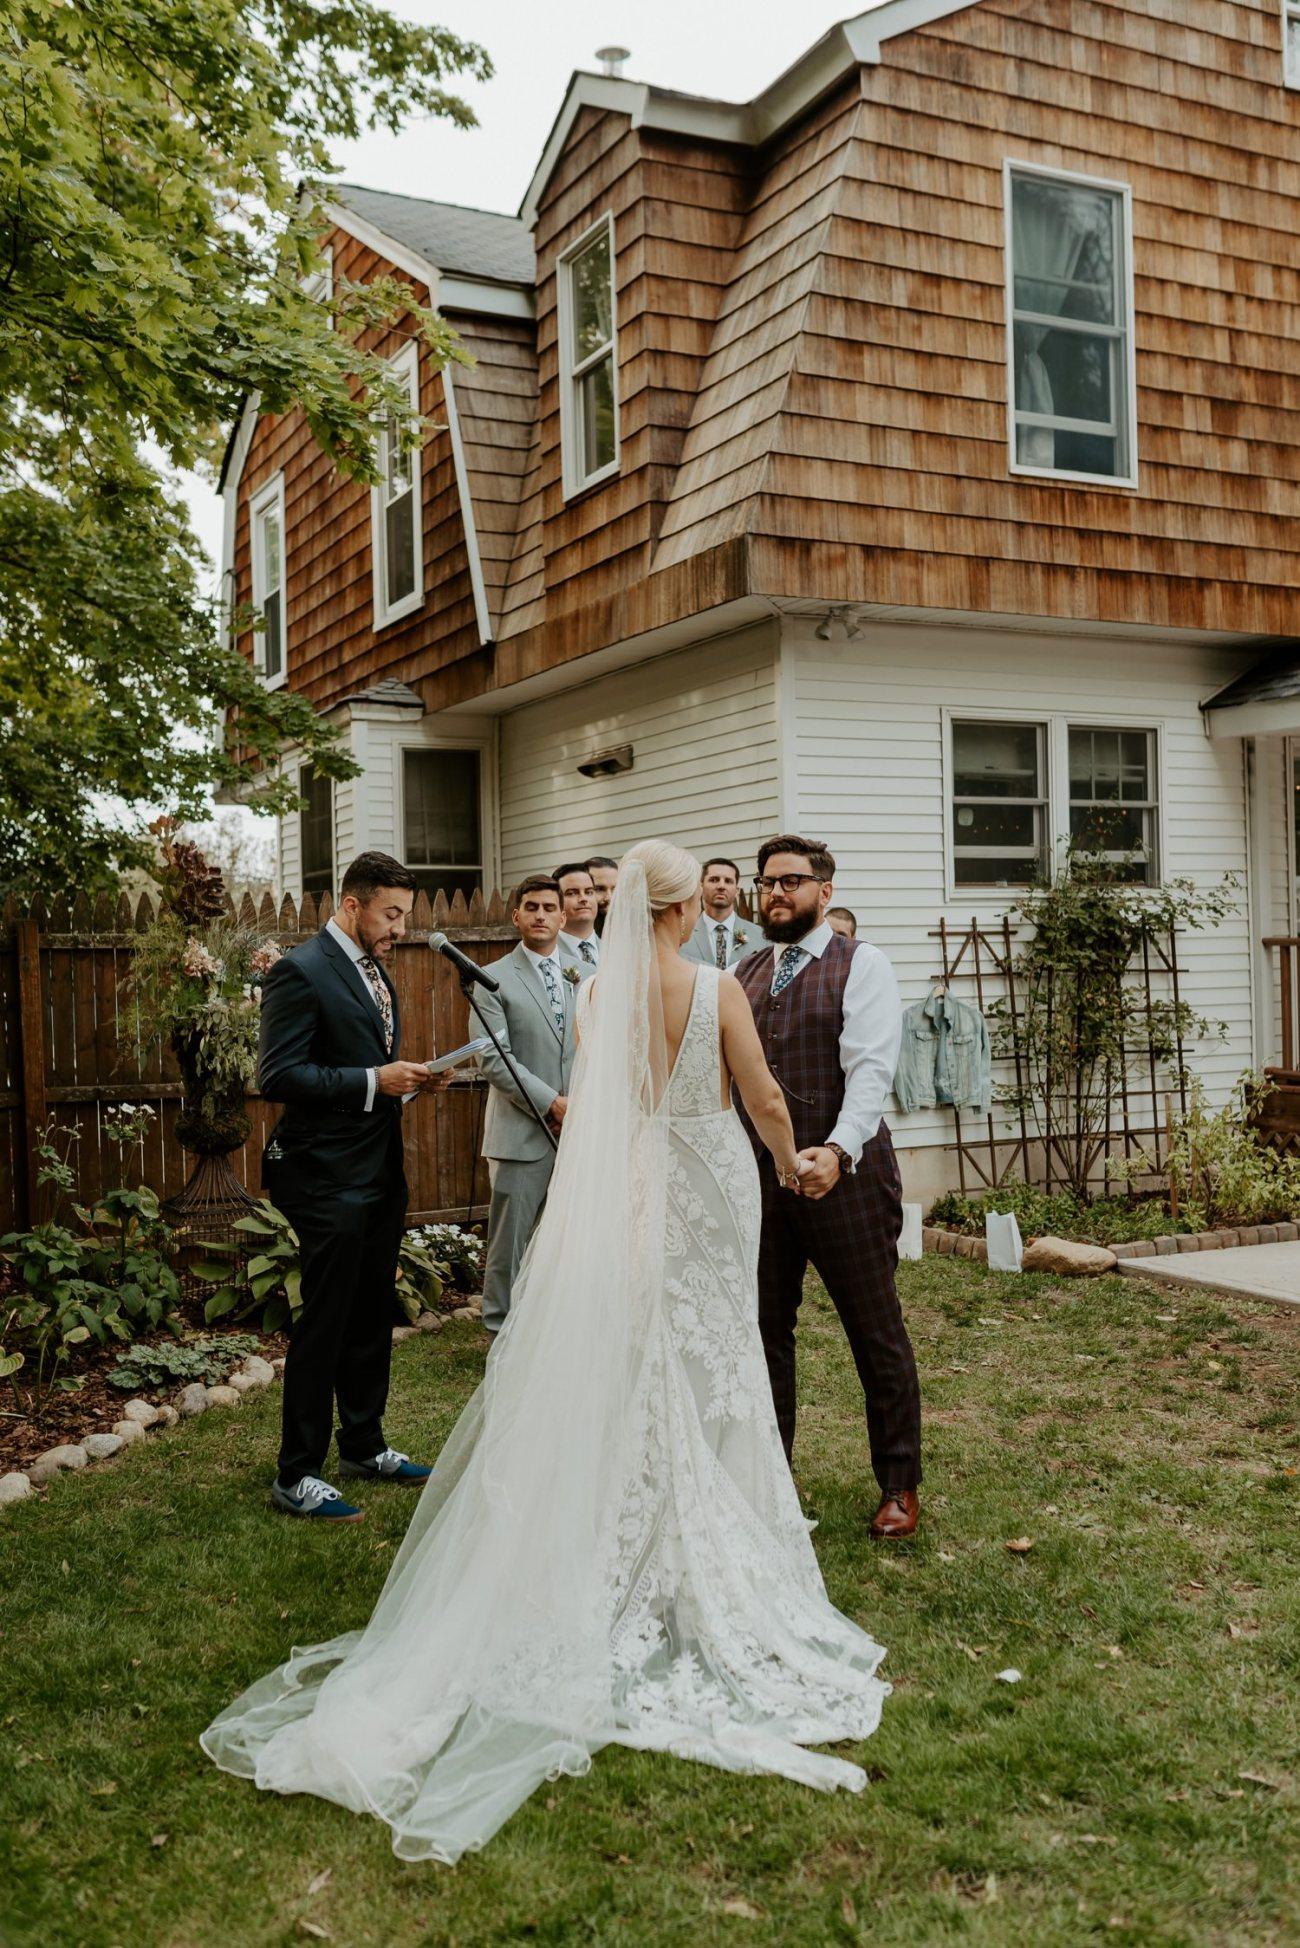 New Jersey Fall Backyard Wedding Bend Wedding Photographer NJ Wedding Photographer Anais Possamai Photography 042